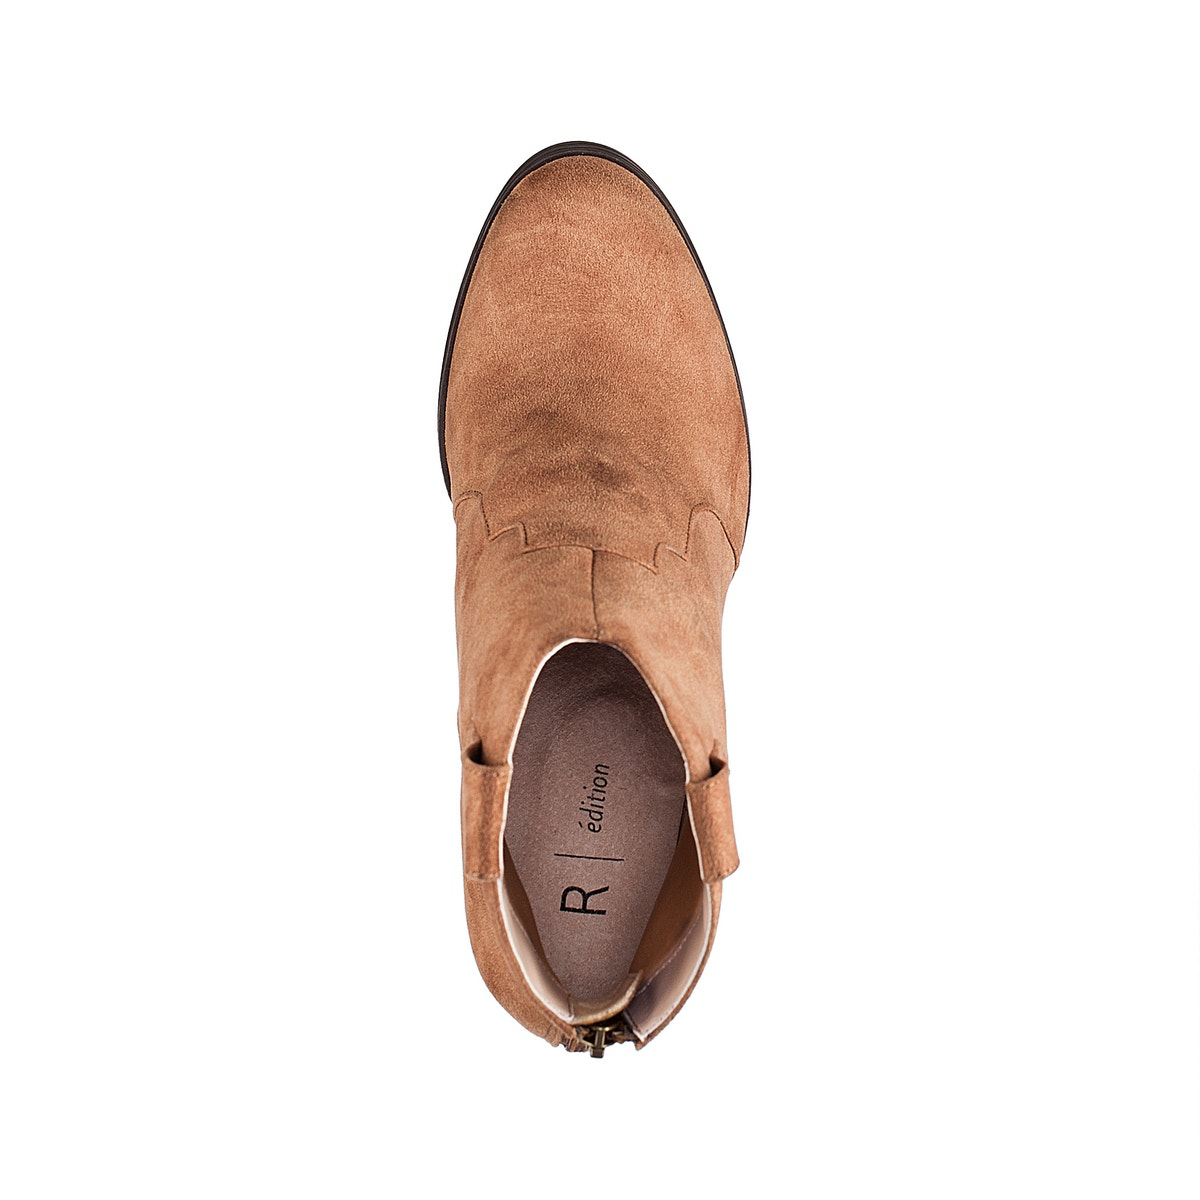 La ROToute Collections Collections Collections Damenschuhe High-Heeled Cowboy Stiefel 9506cd